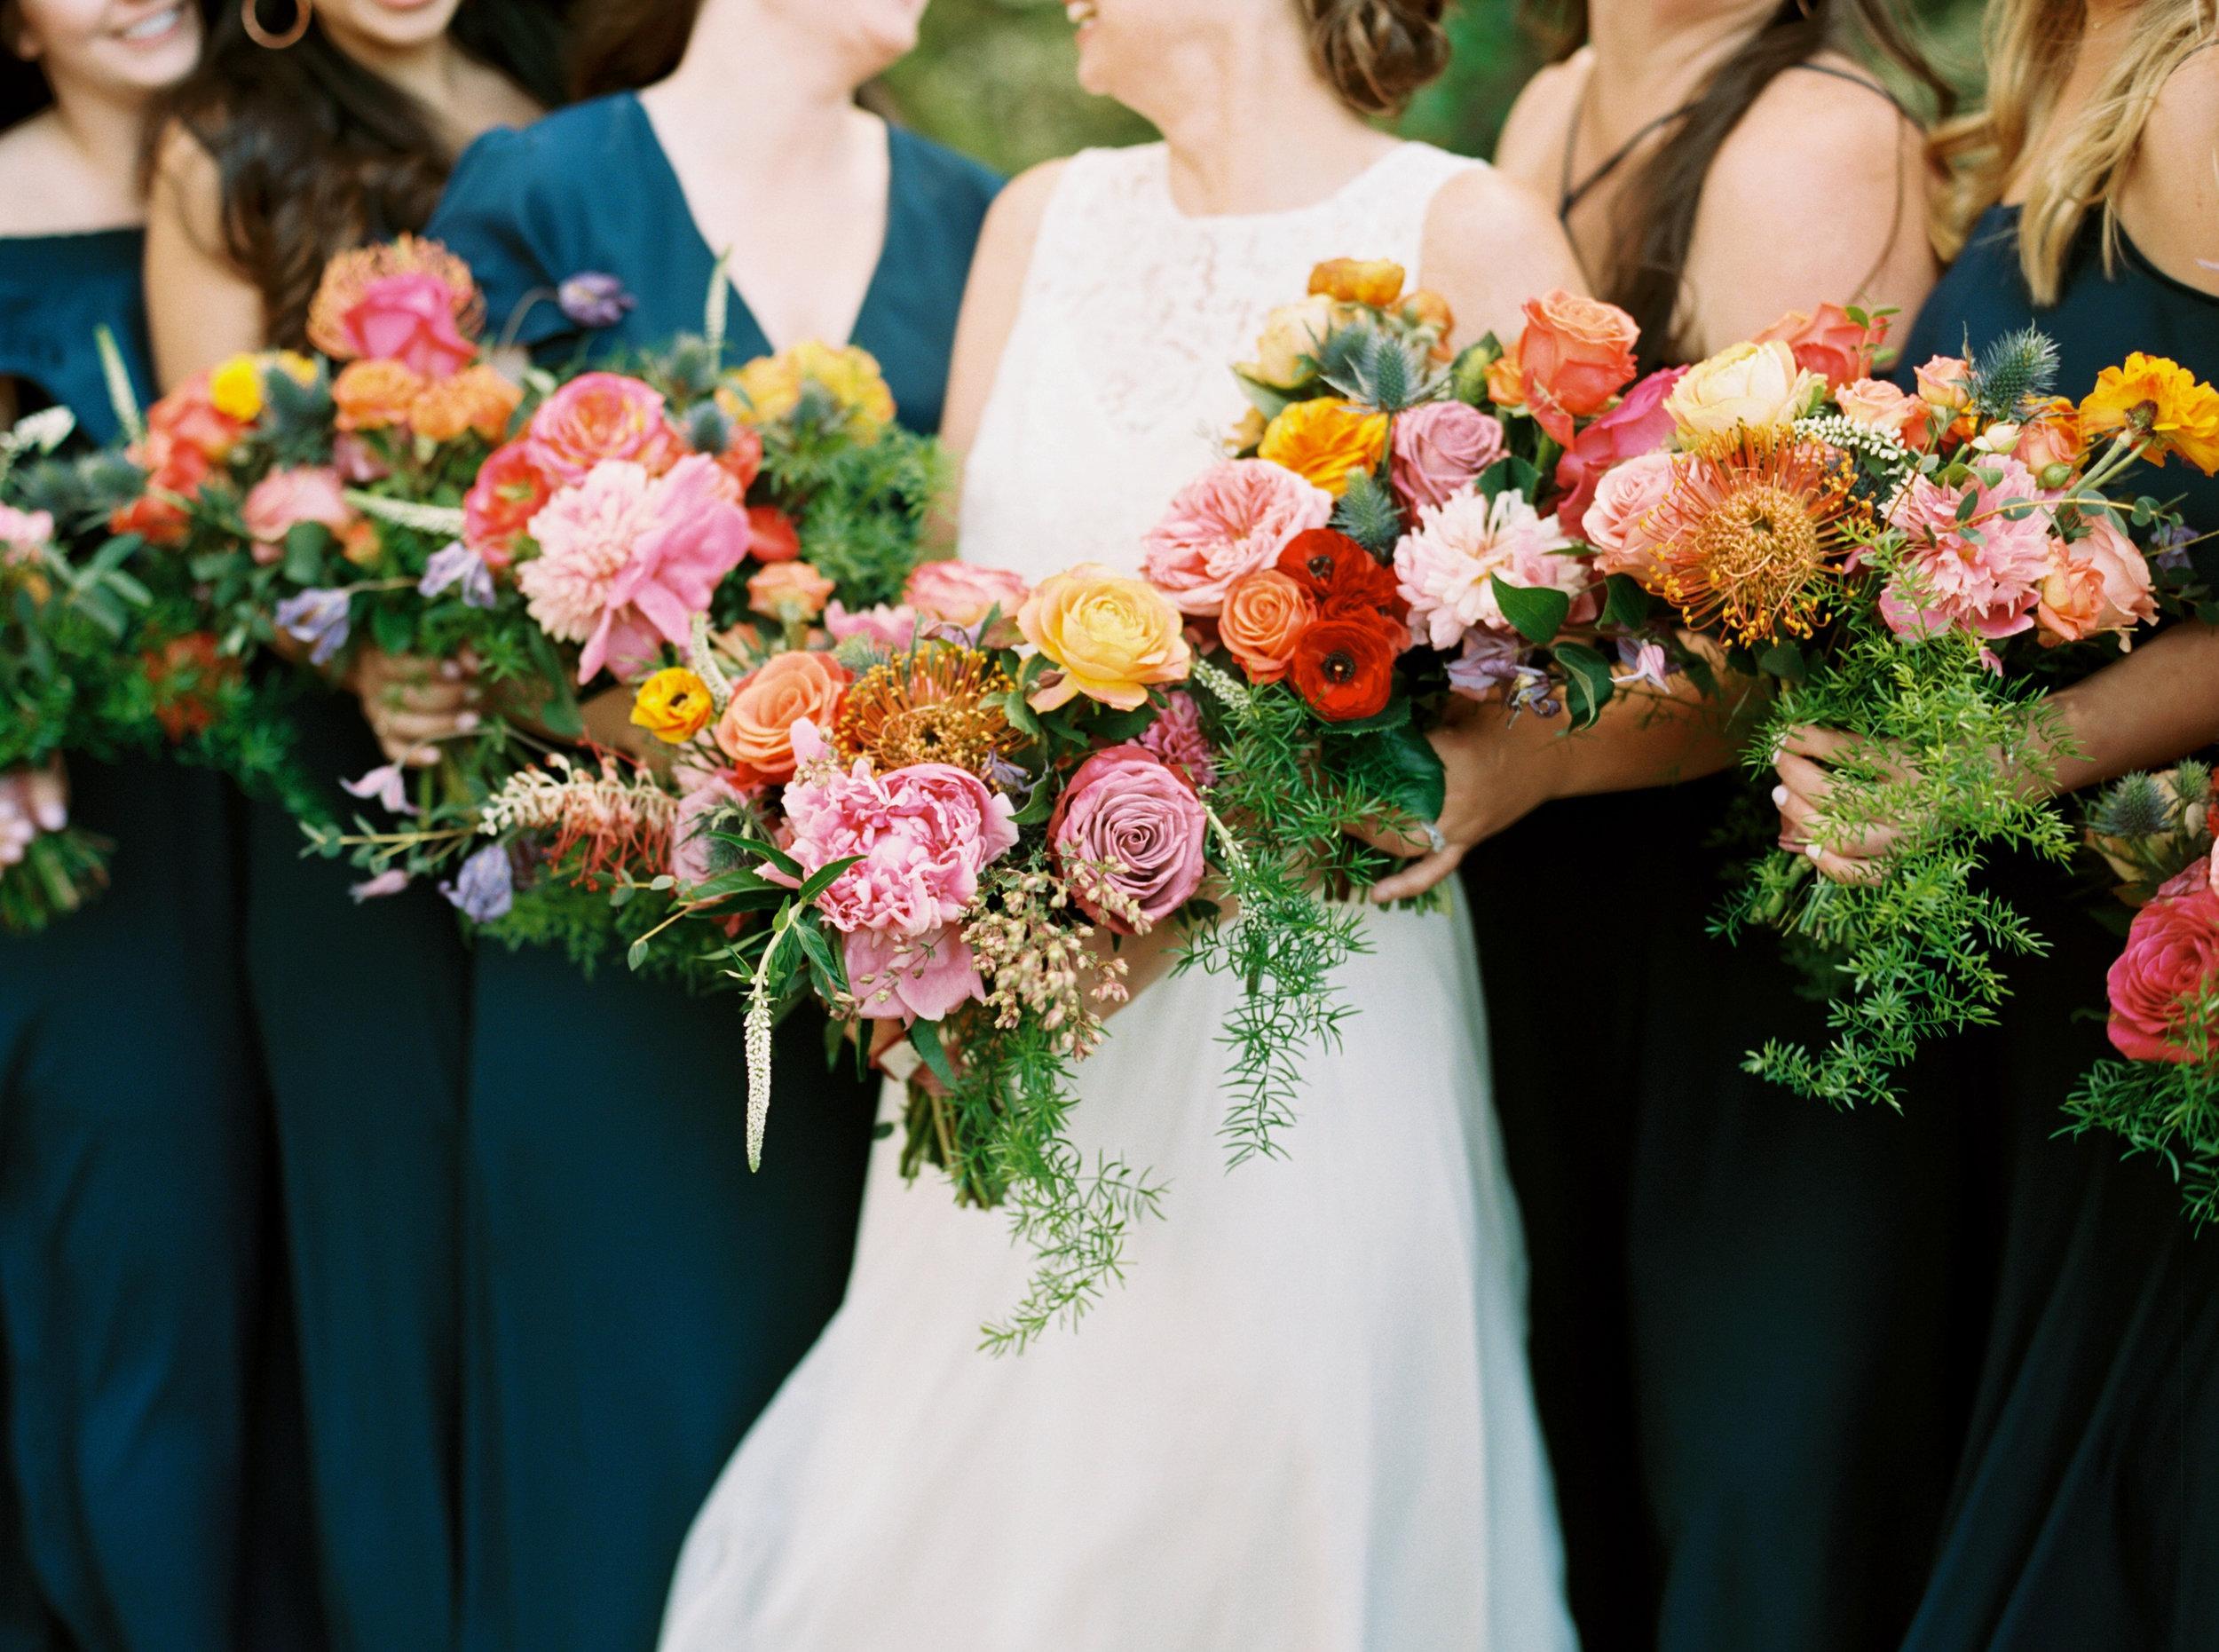 Tucker_Kristina_Wedding_Presidio_San_Francisco_Abigail_Malone_Photography-462.jpg